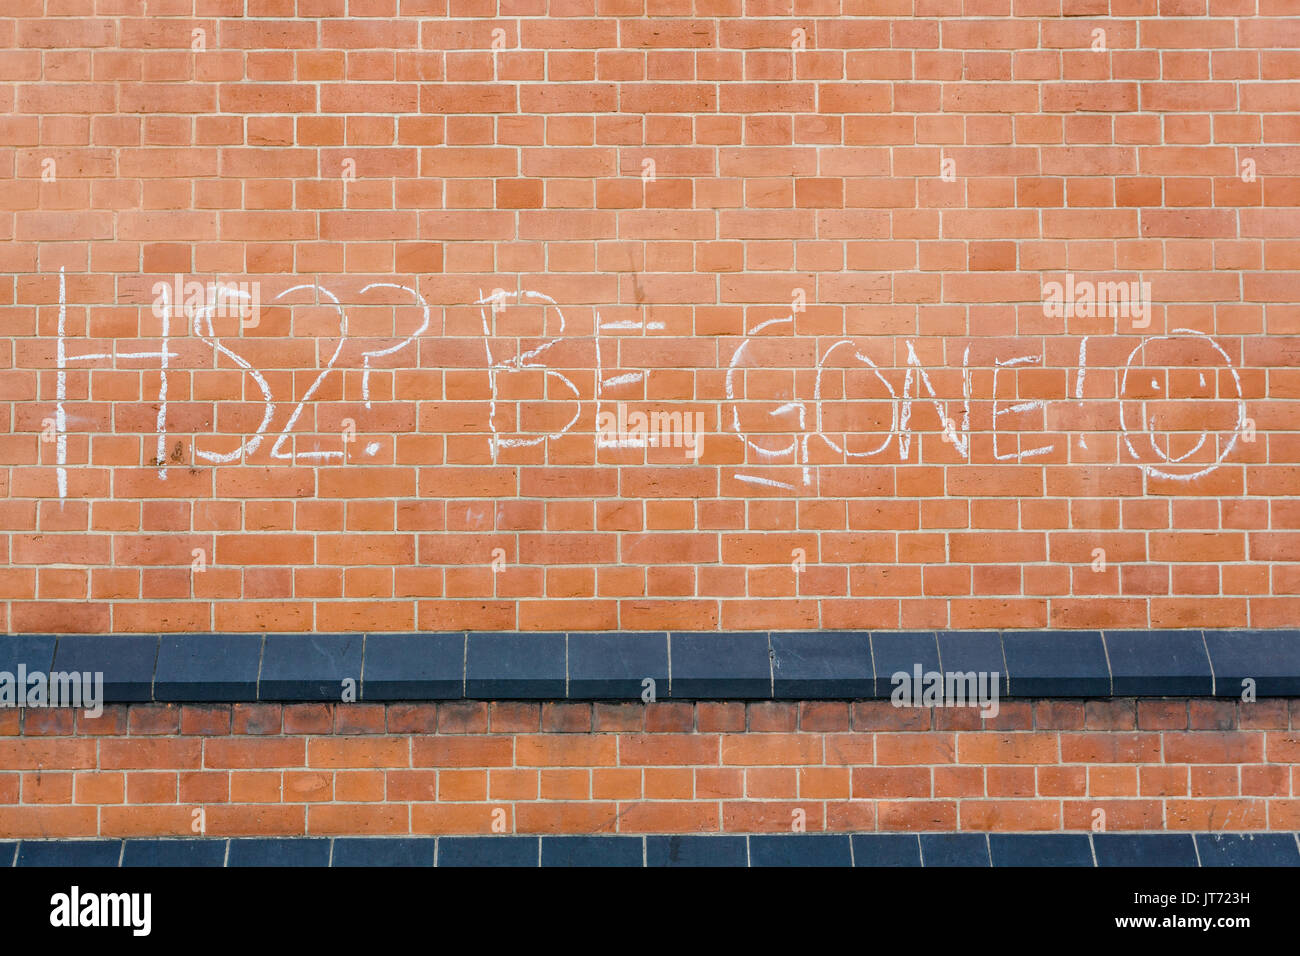 HS2 protest graffiti, King's Cross, London Stock Photo